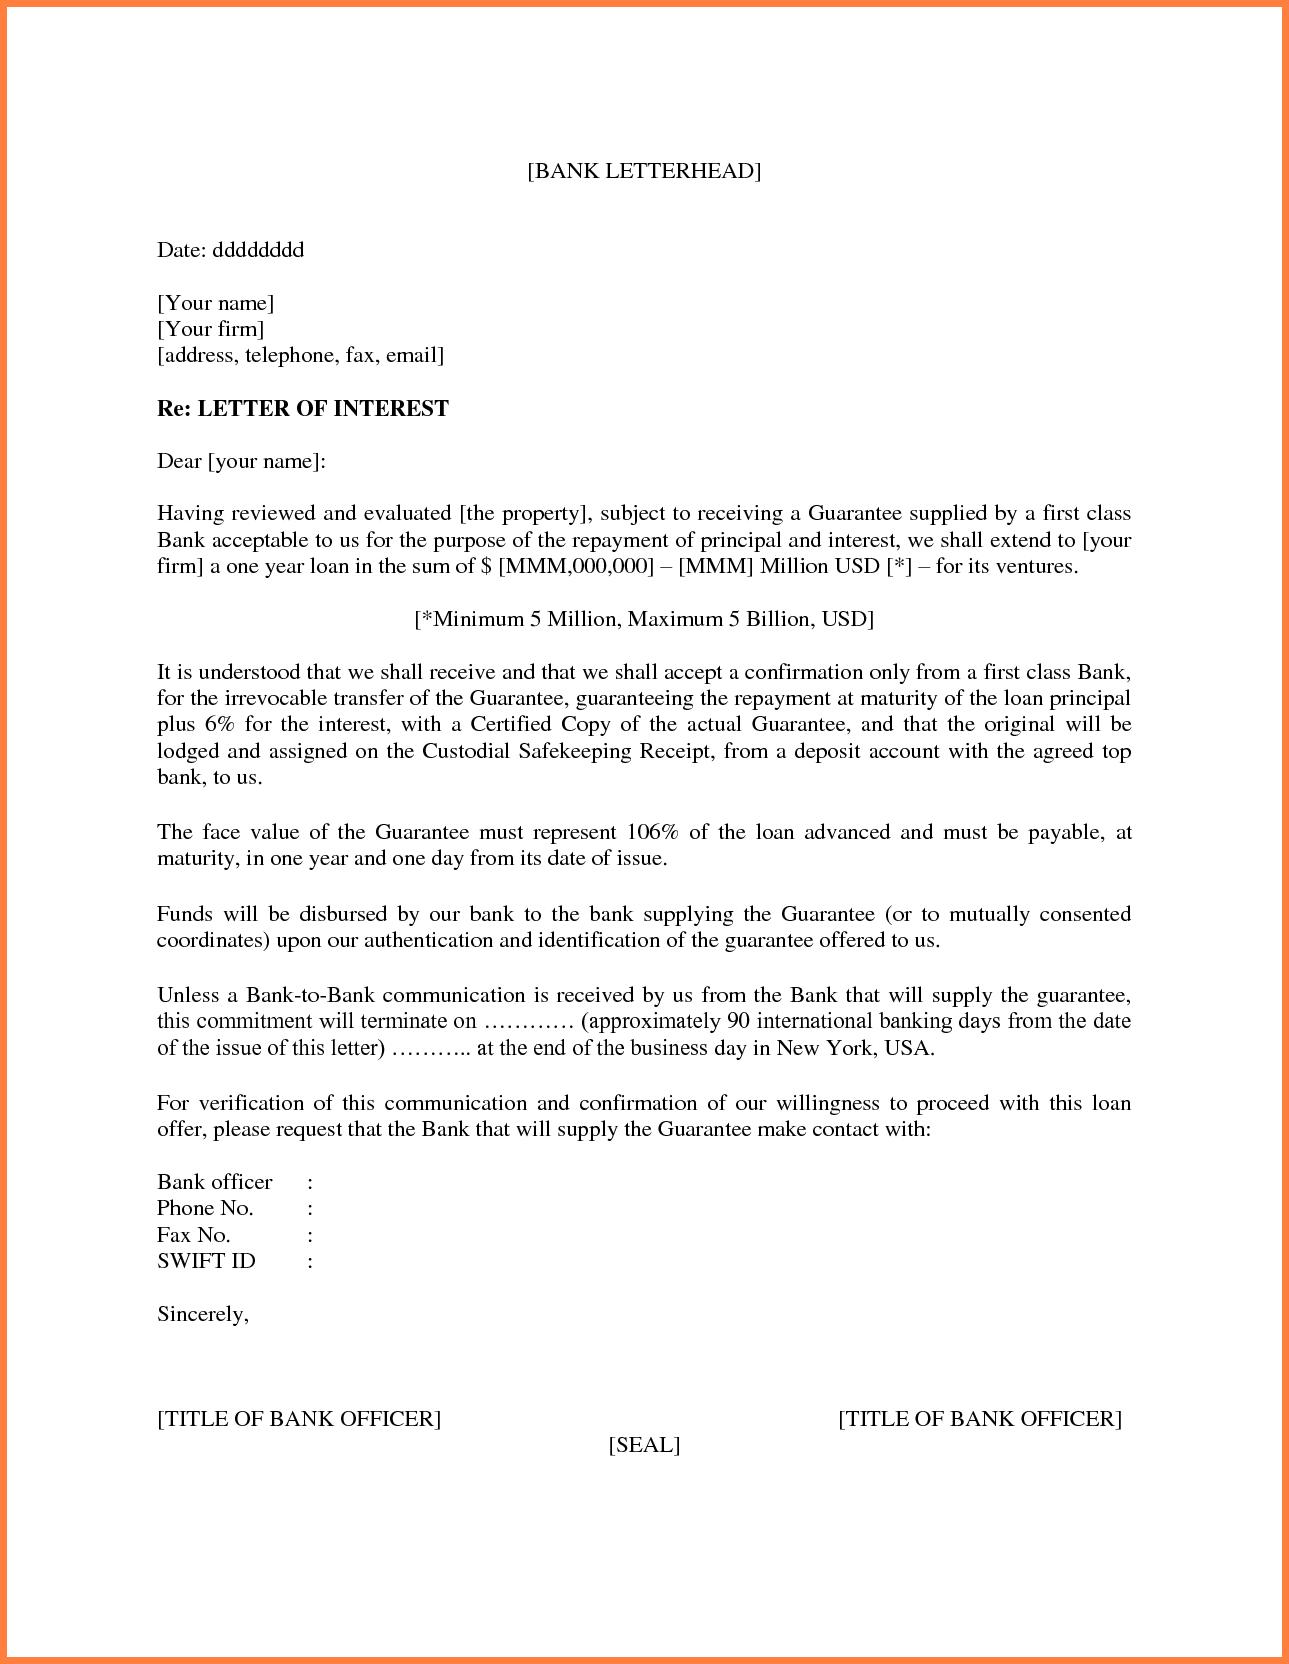 006 Template Ideas Letter Of Interest Microsoft Word Inside Letter Of Interest Template Microsoft Word